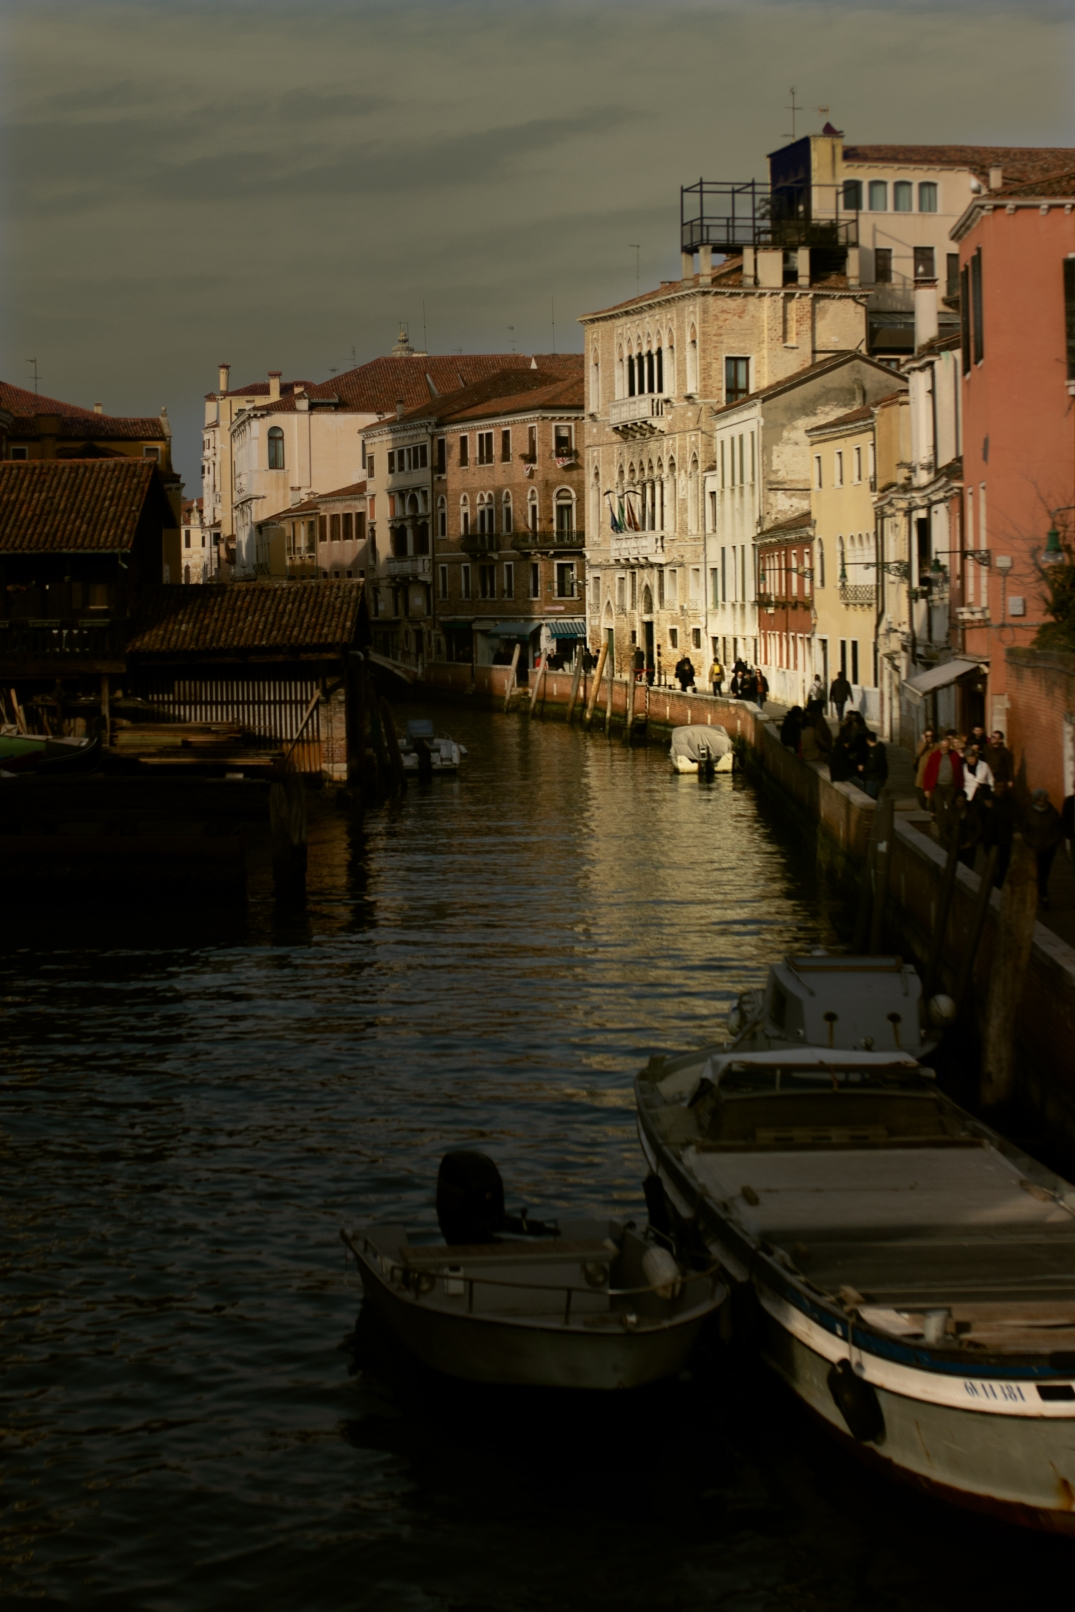 venedig schiff kleiner Kanal